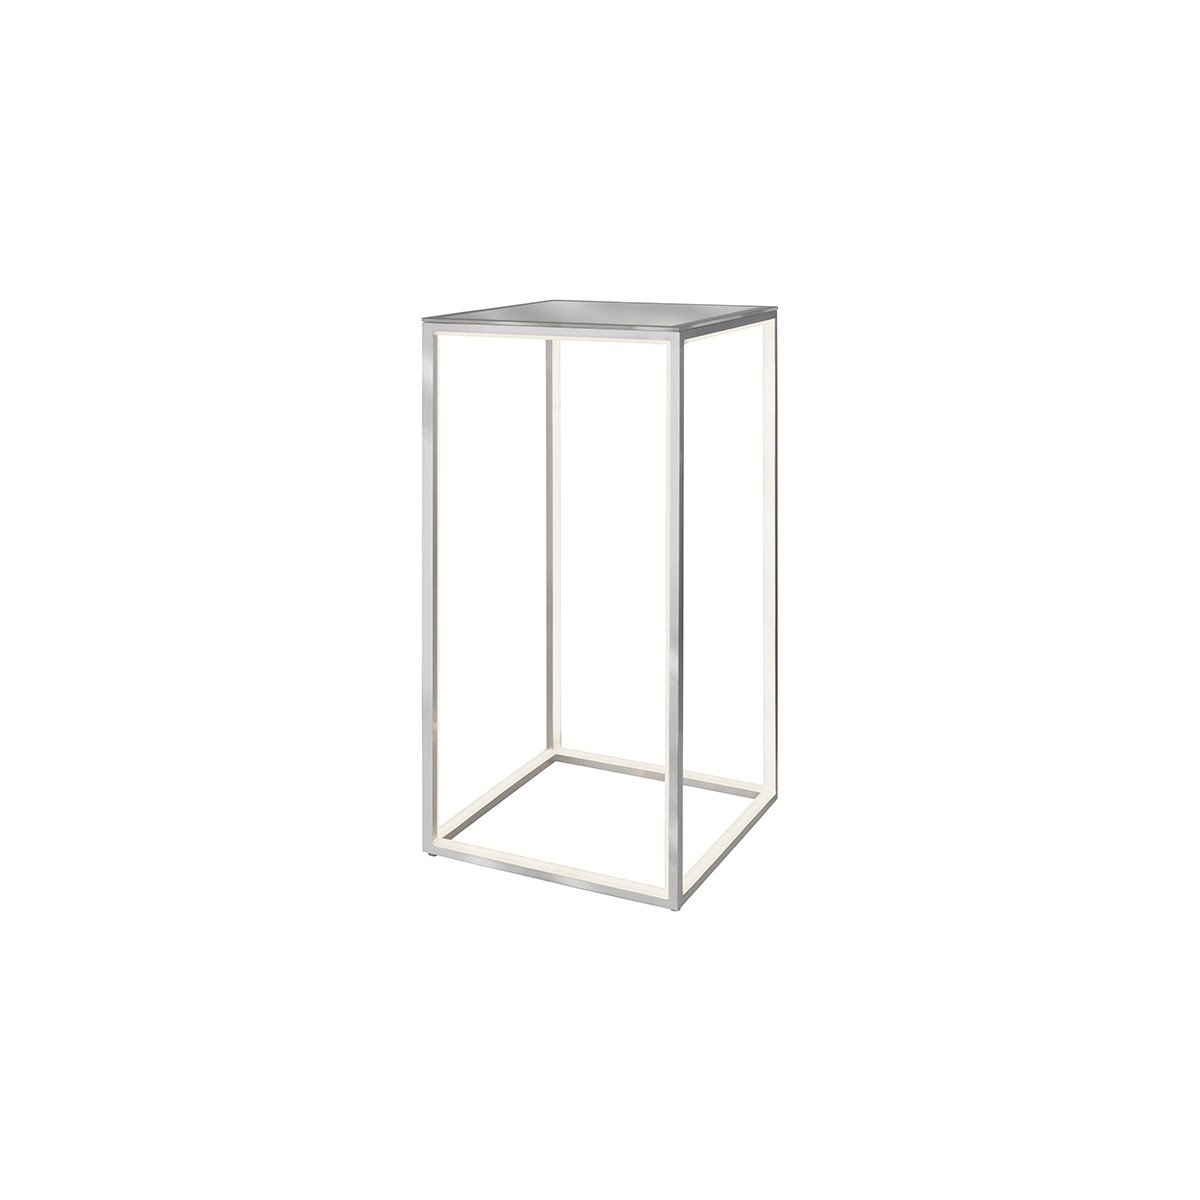 Sompex Delux LED Stehleuchte 60 x 30 cm, Aluminium, Glas: gefrostet